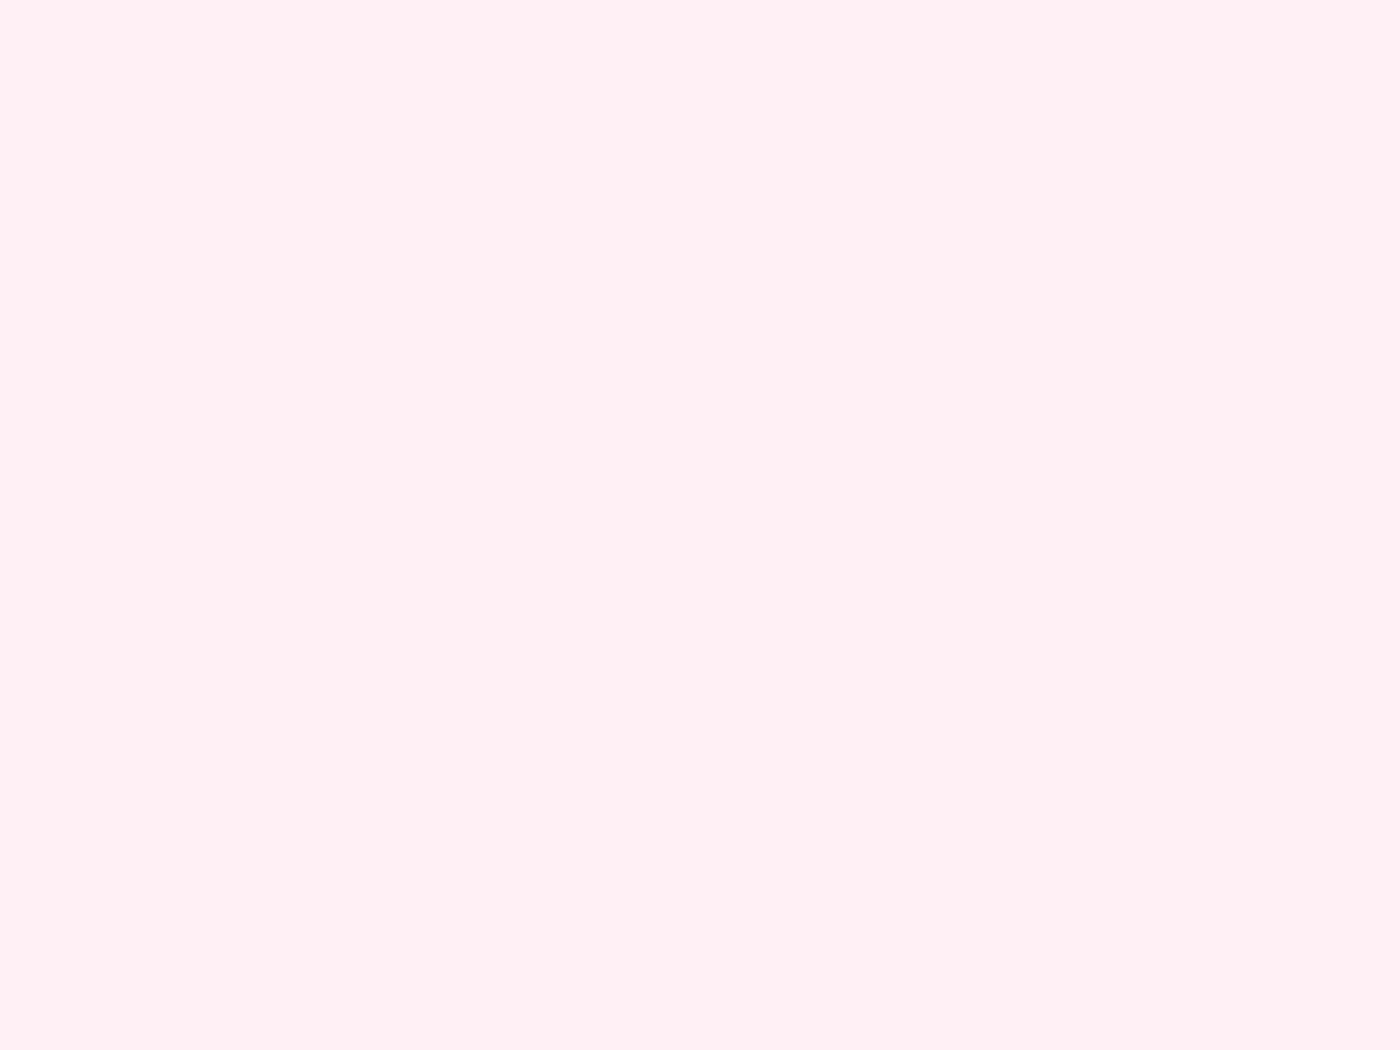 1400x1050 Lavender Blush Solid Color Background